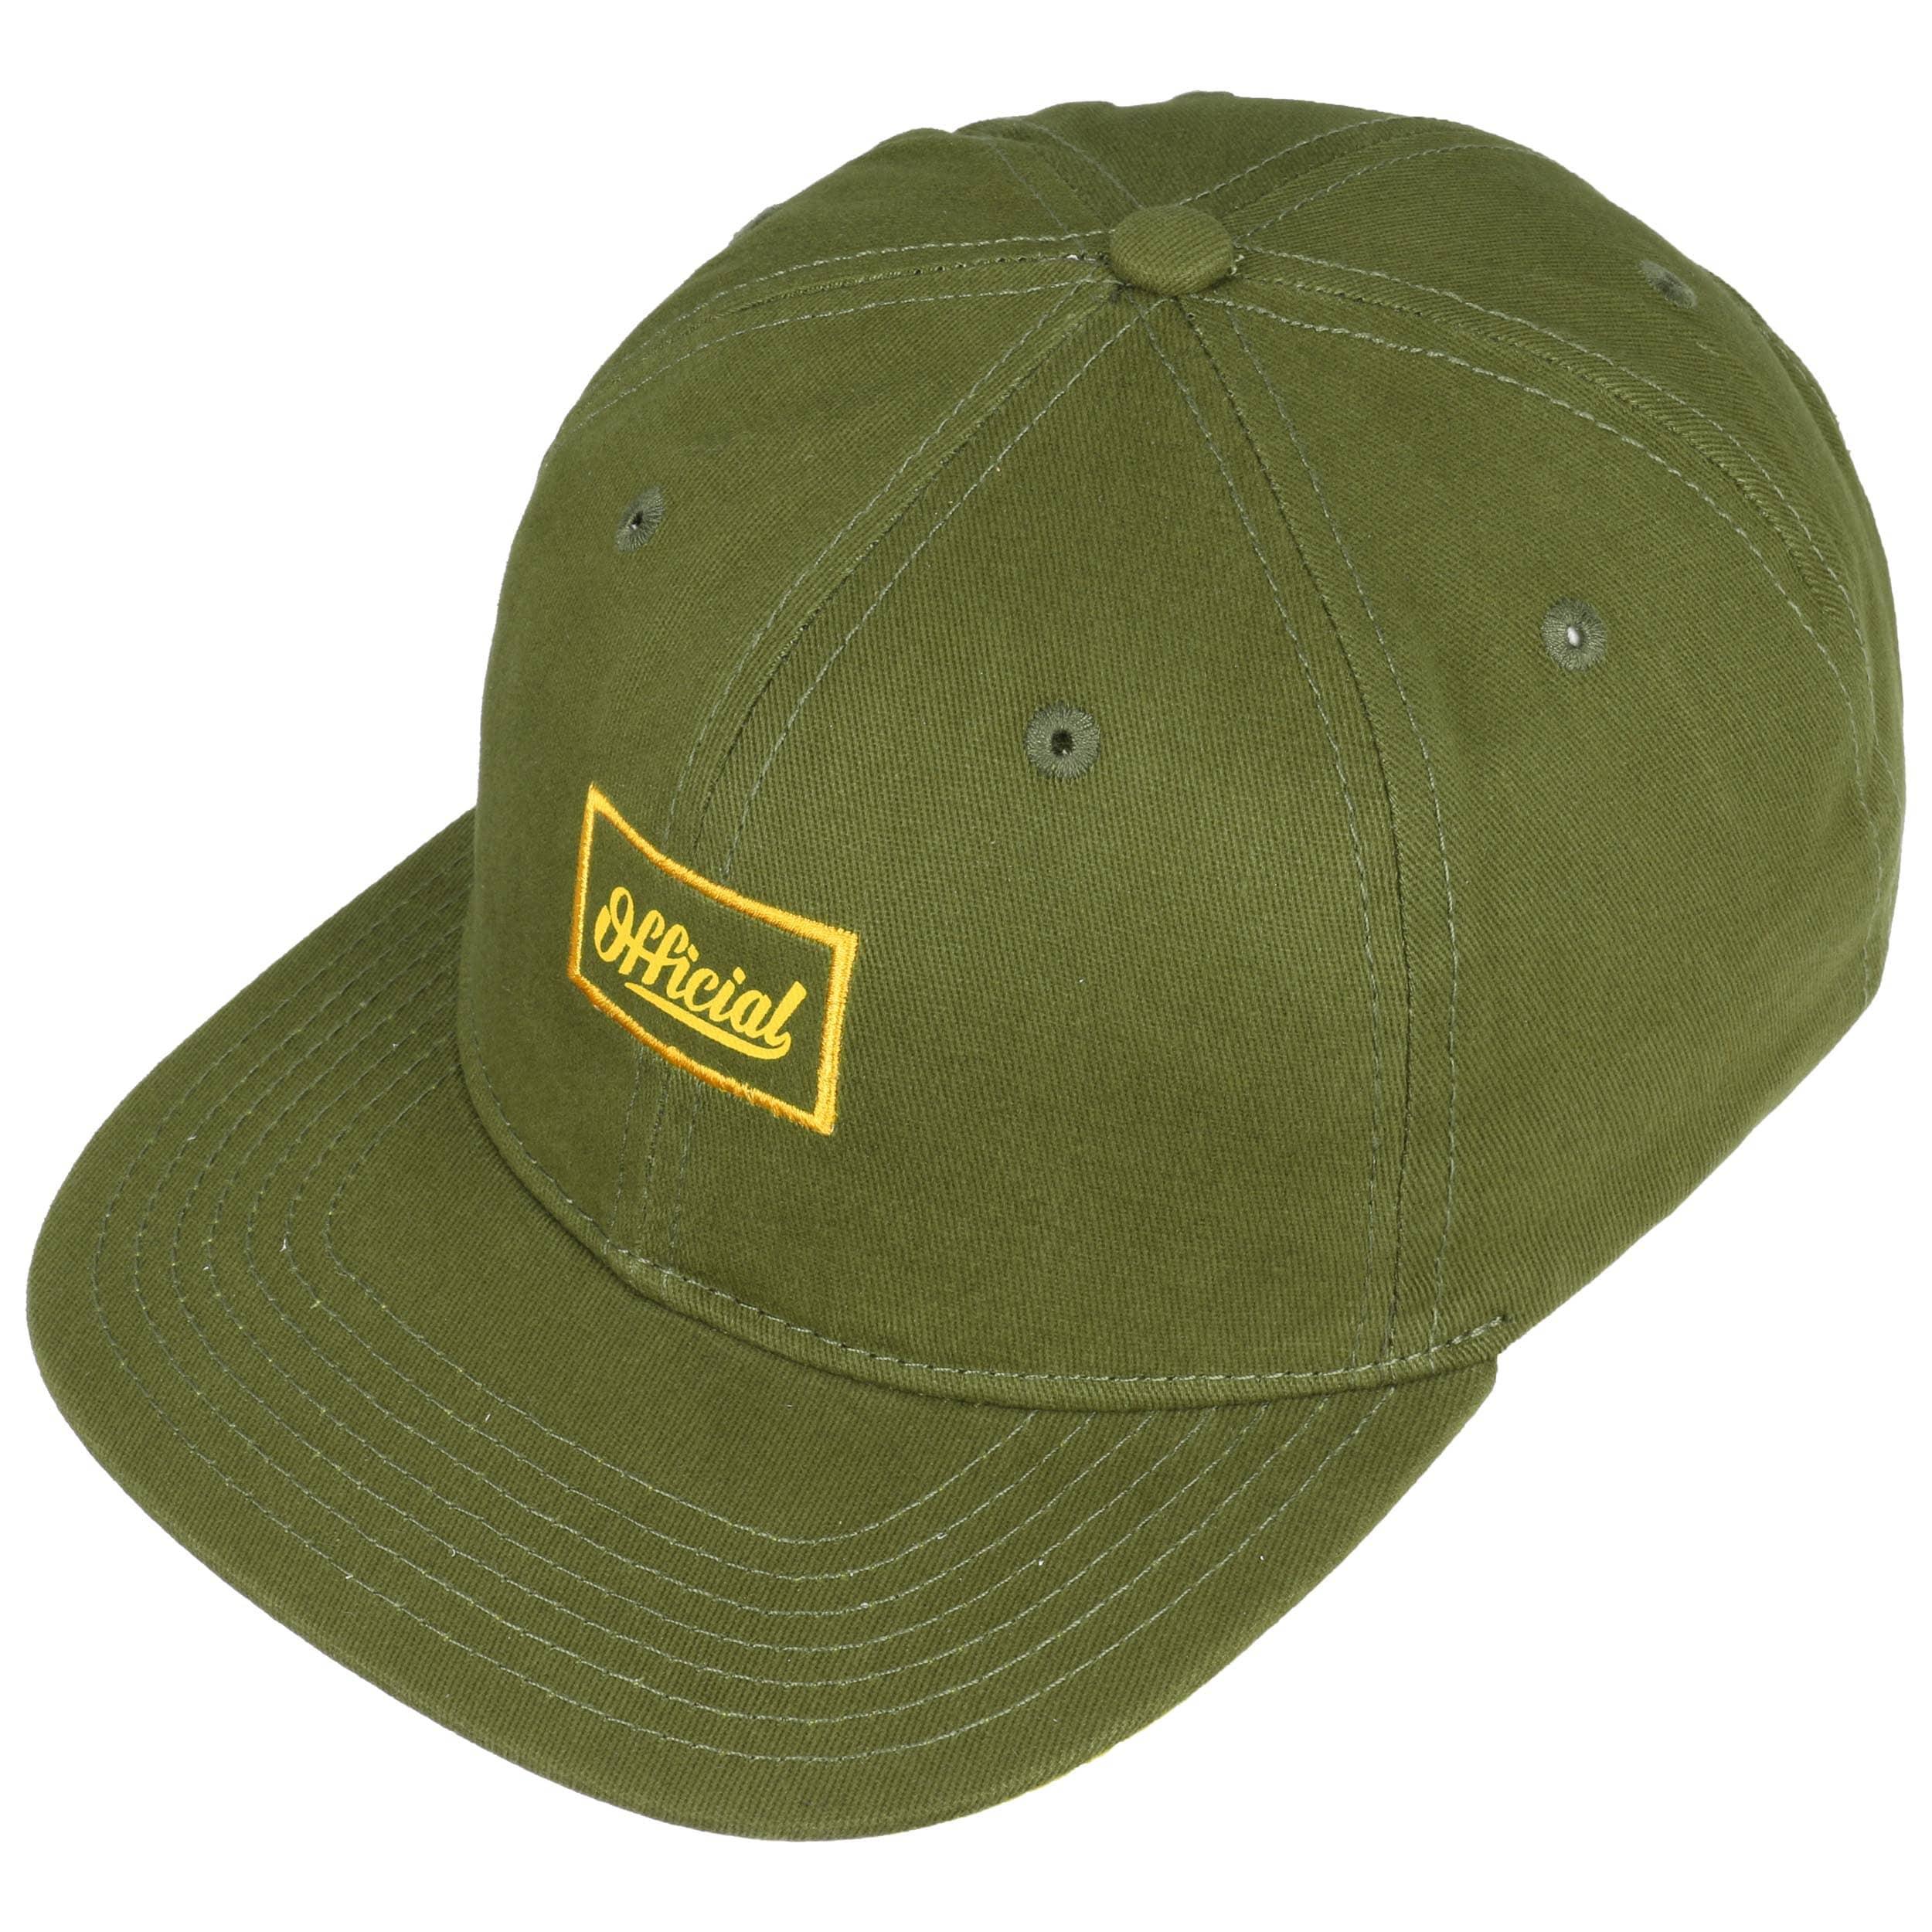 08748648e52b4 Yardie Snapback Cap by Official Headwear - olive 1 ...